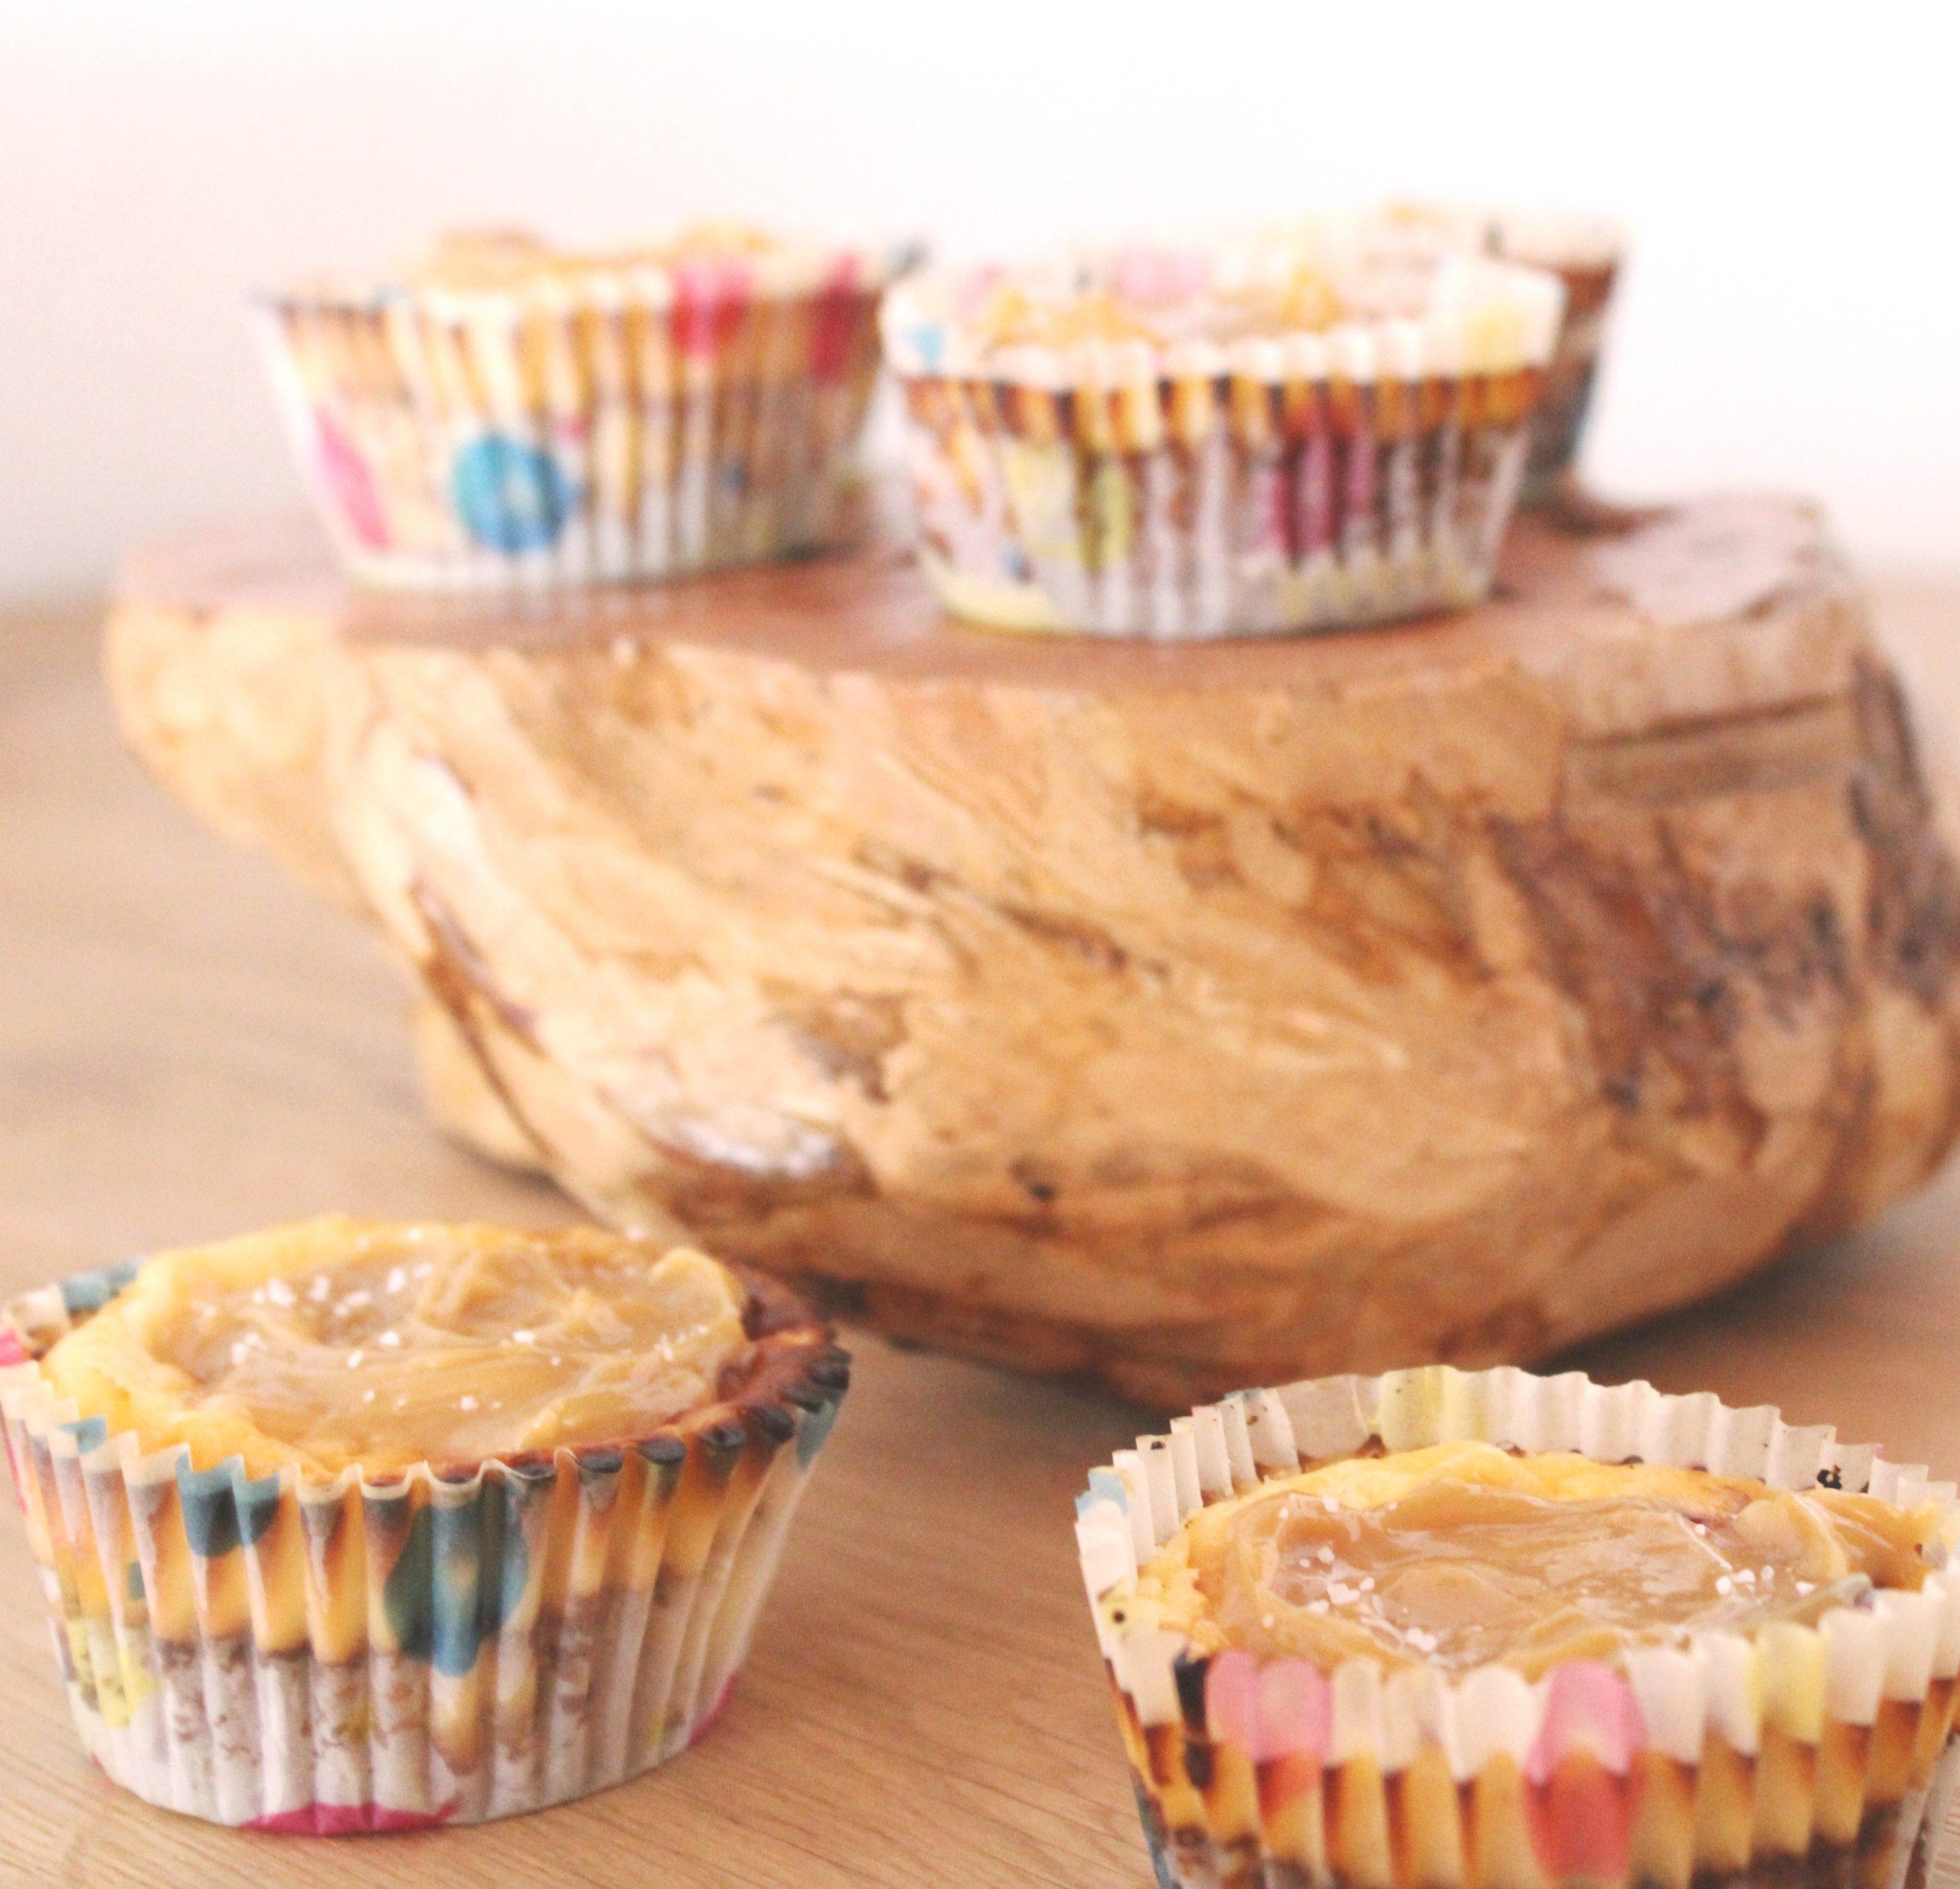 Kaesekuchen-Muffin-mit-gesalzenem-Karamell